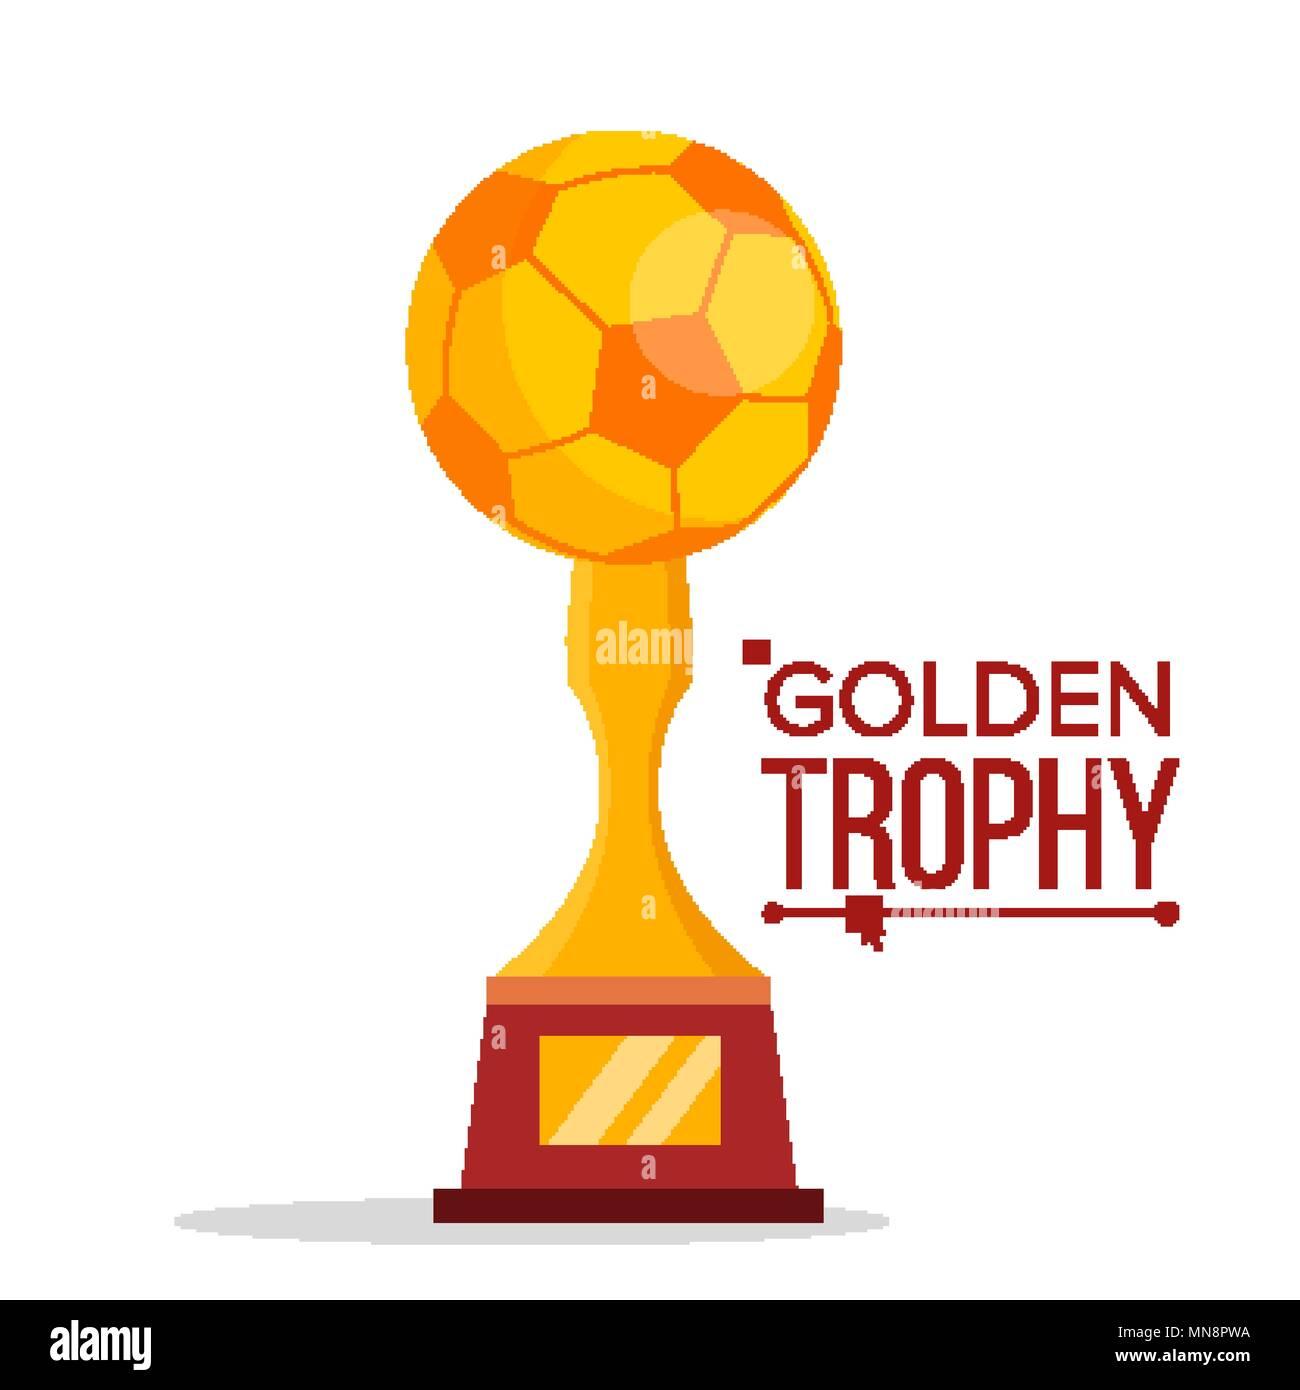 Soccer Golden Trophy Vector World Cup Event Football Ball Championship Design Element